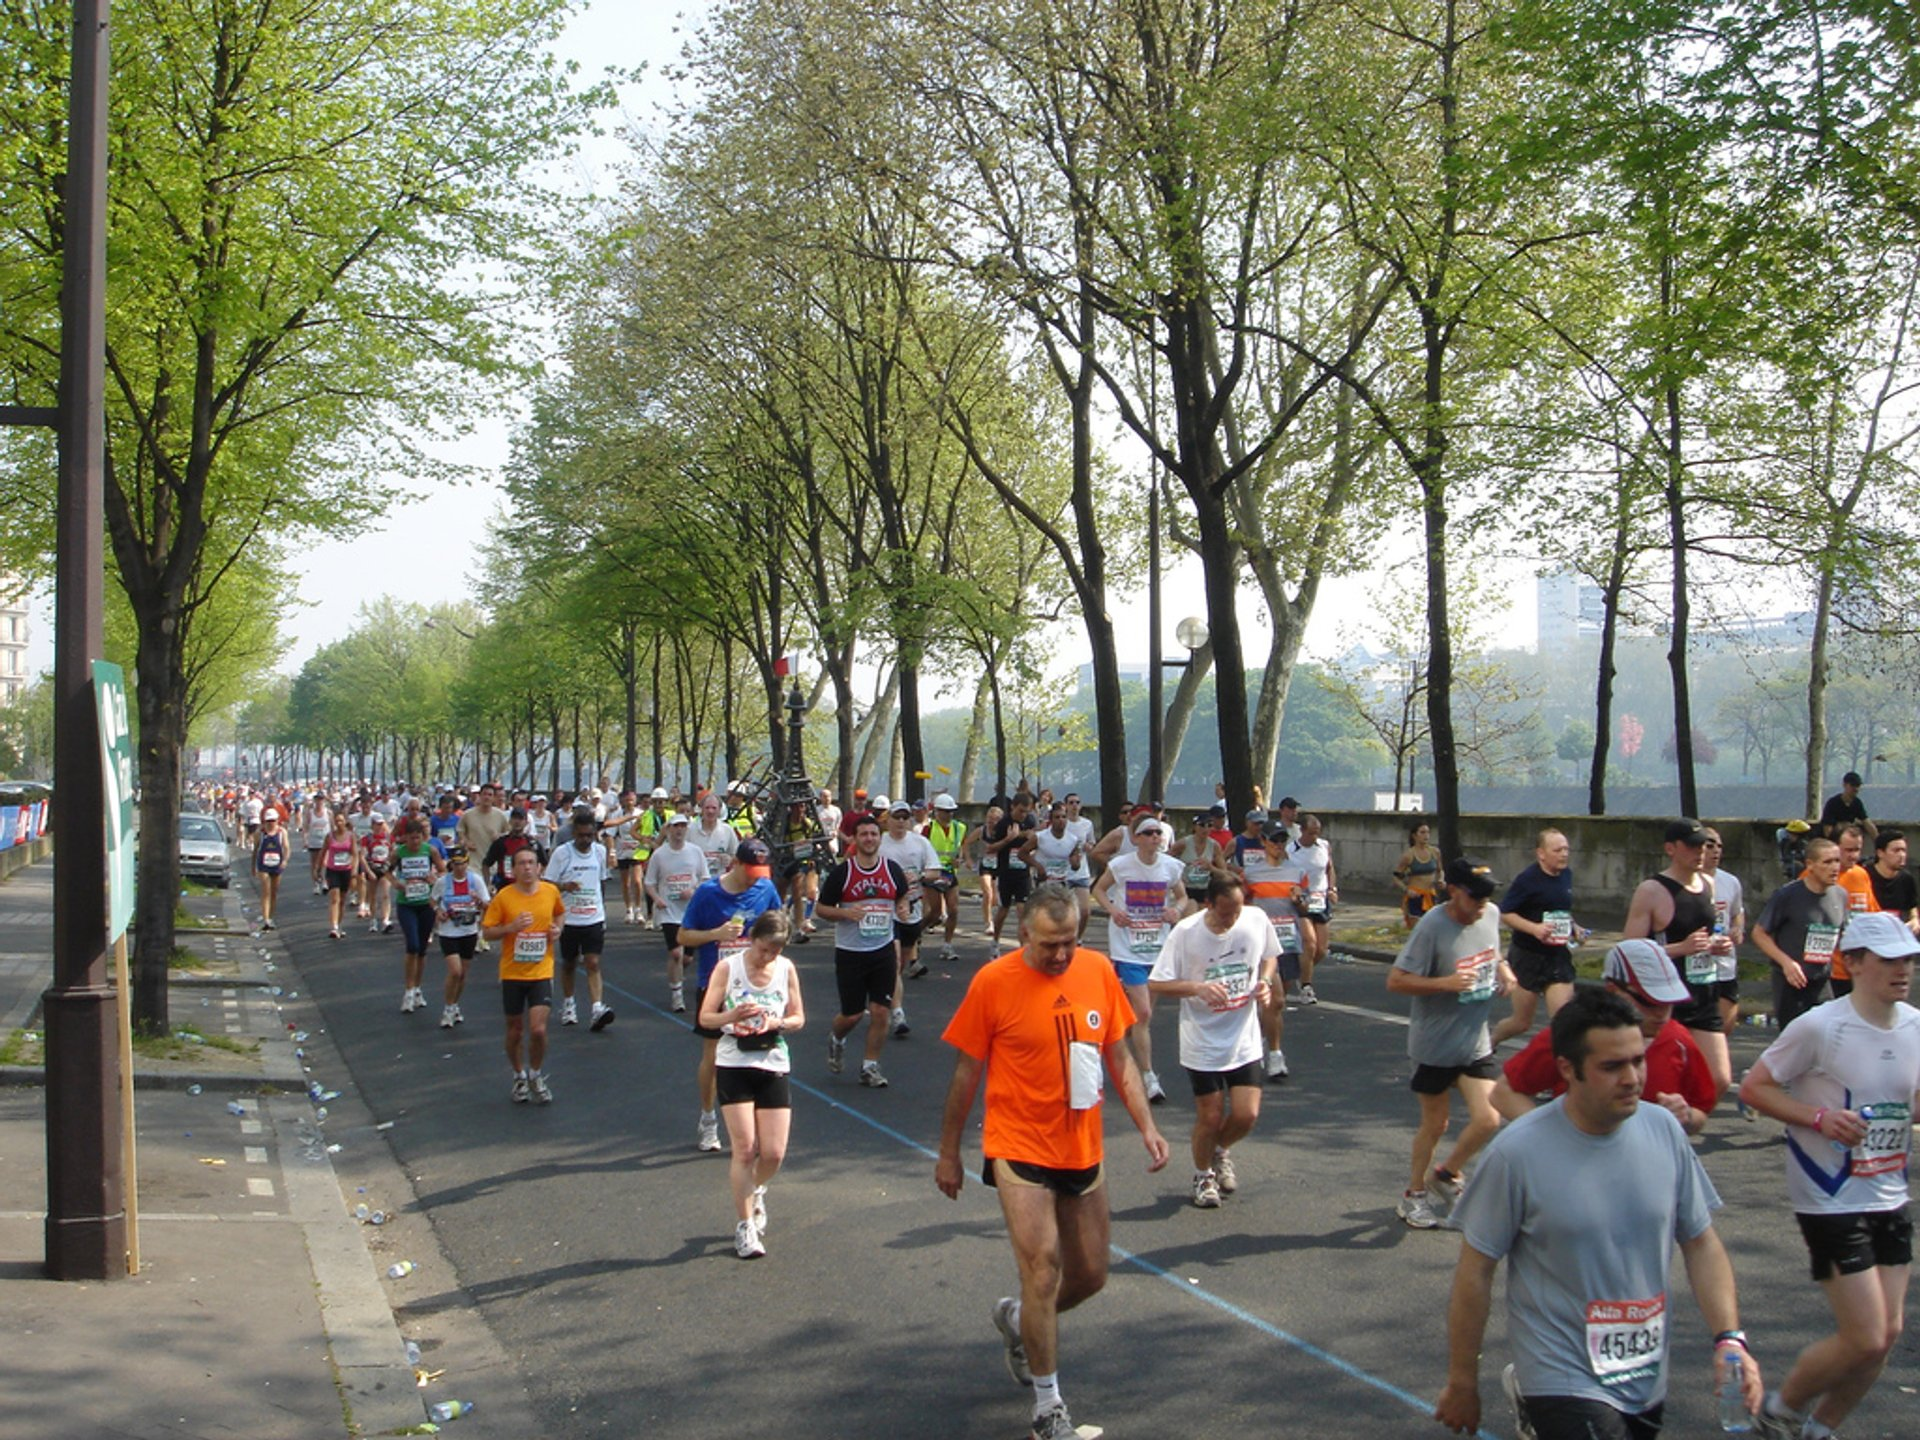 Best time to see Marathon de Paris in Paris 2020